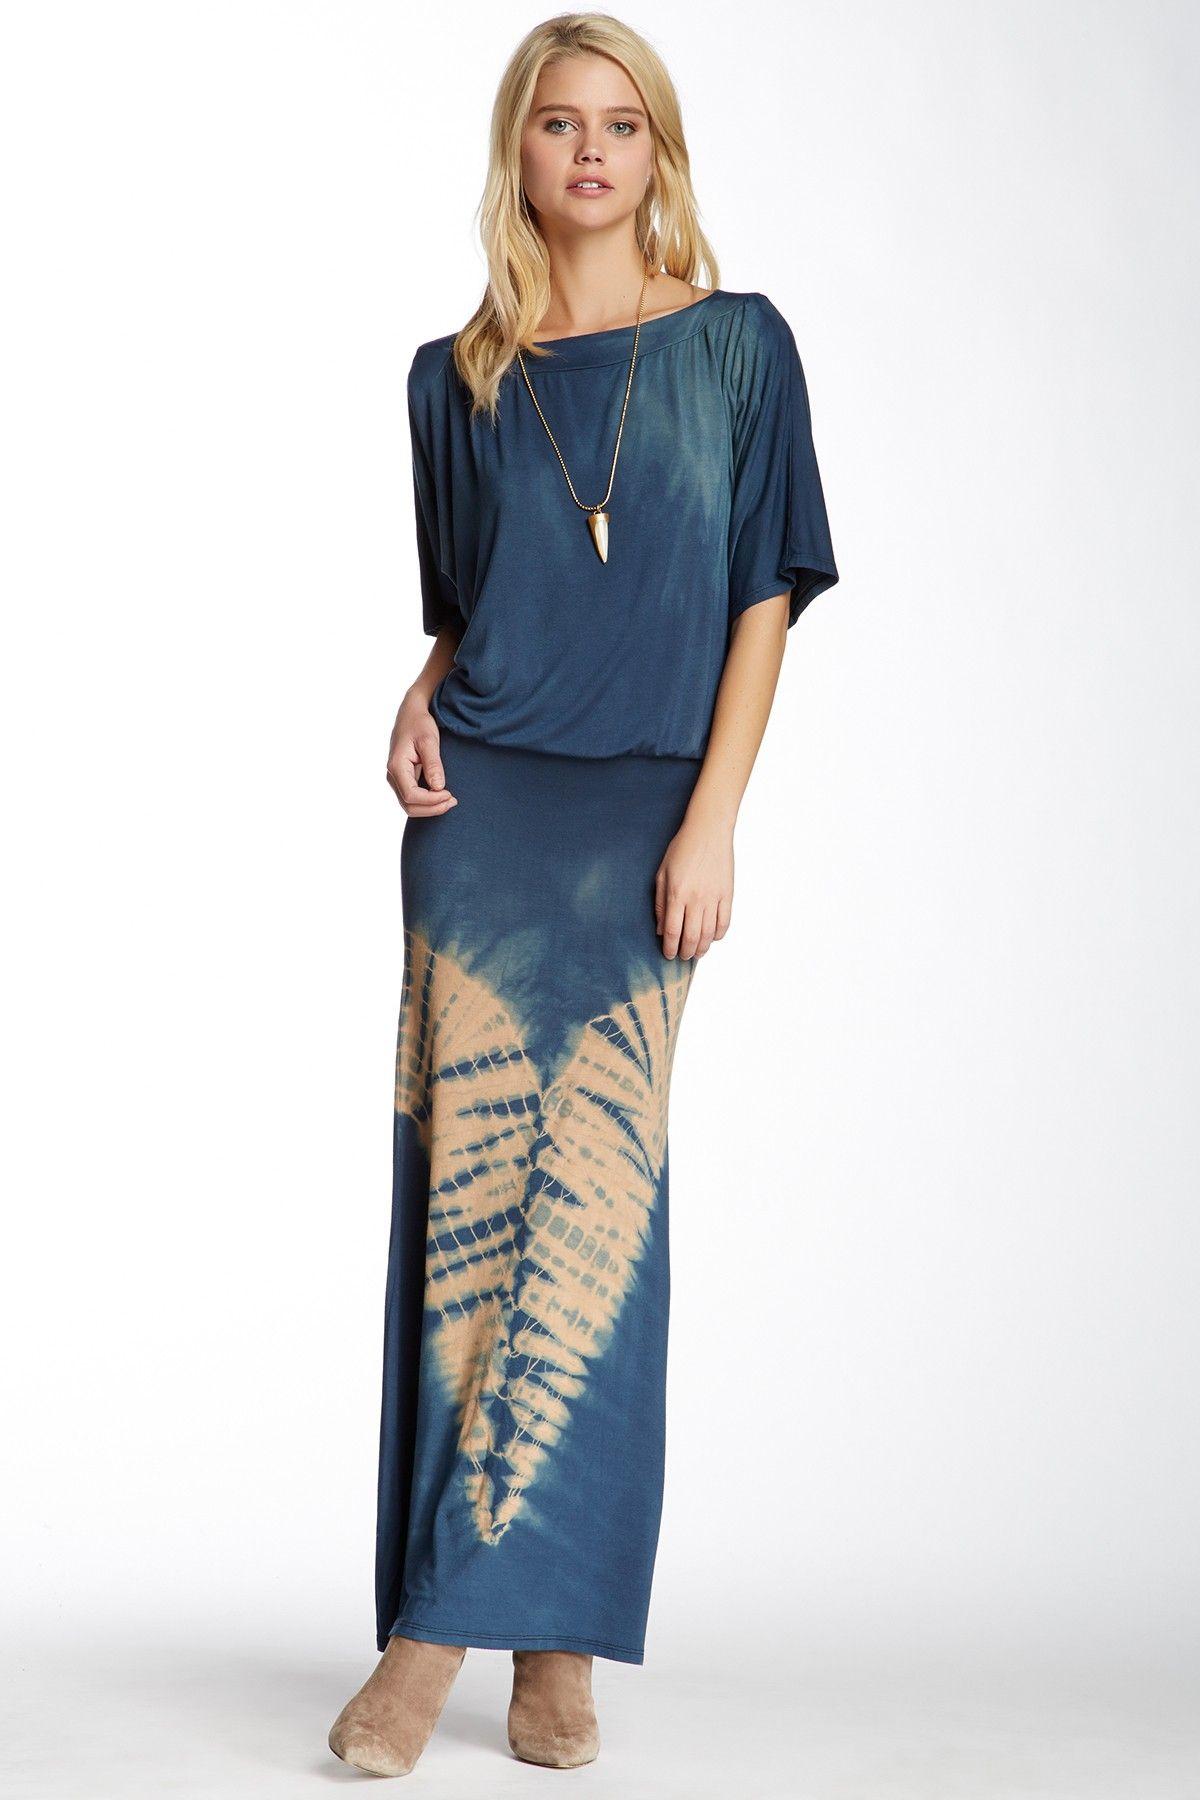 Tiedye short sleeve maxi dress by go couture on hautelook zrób